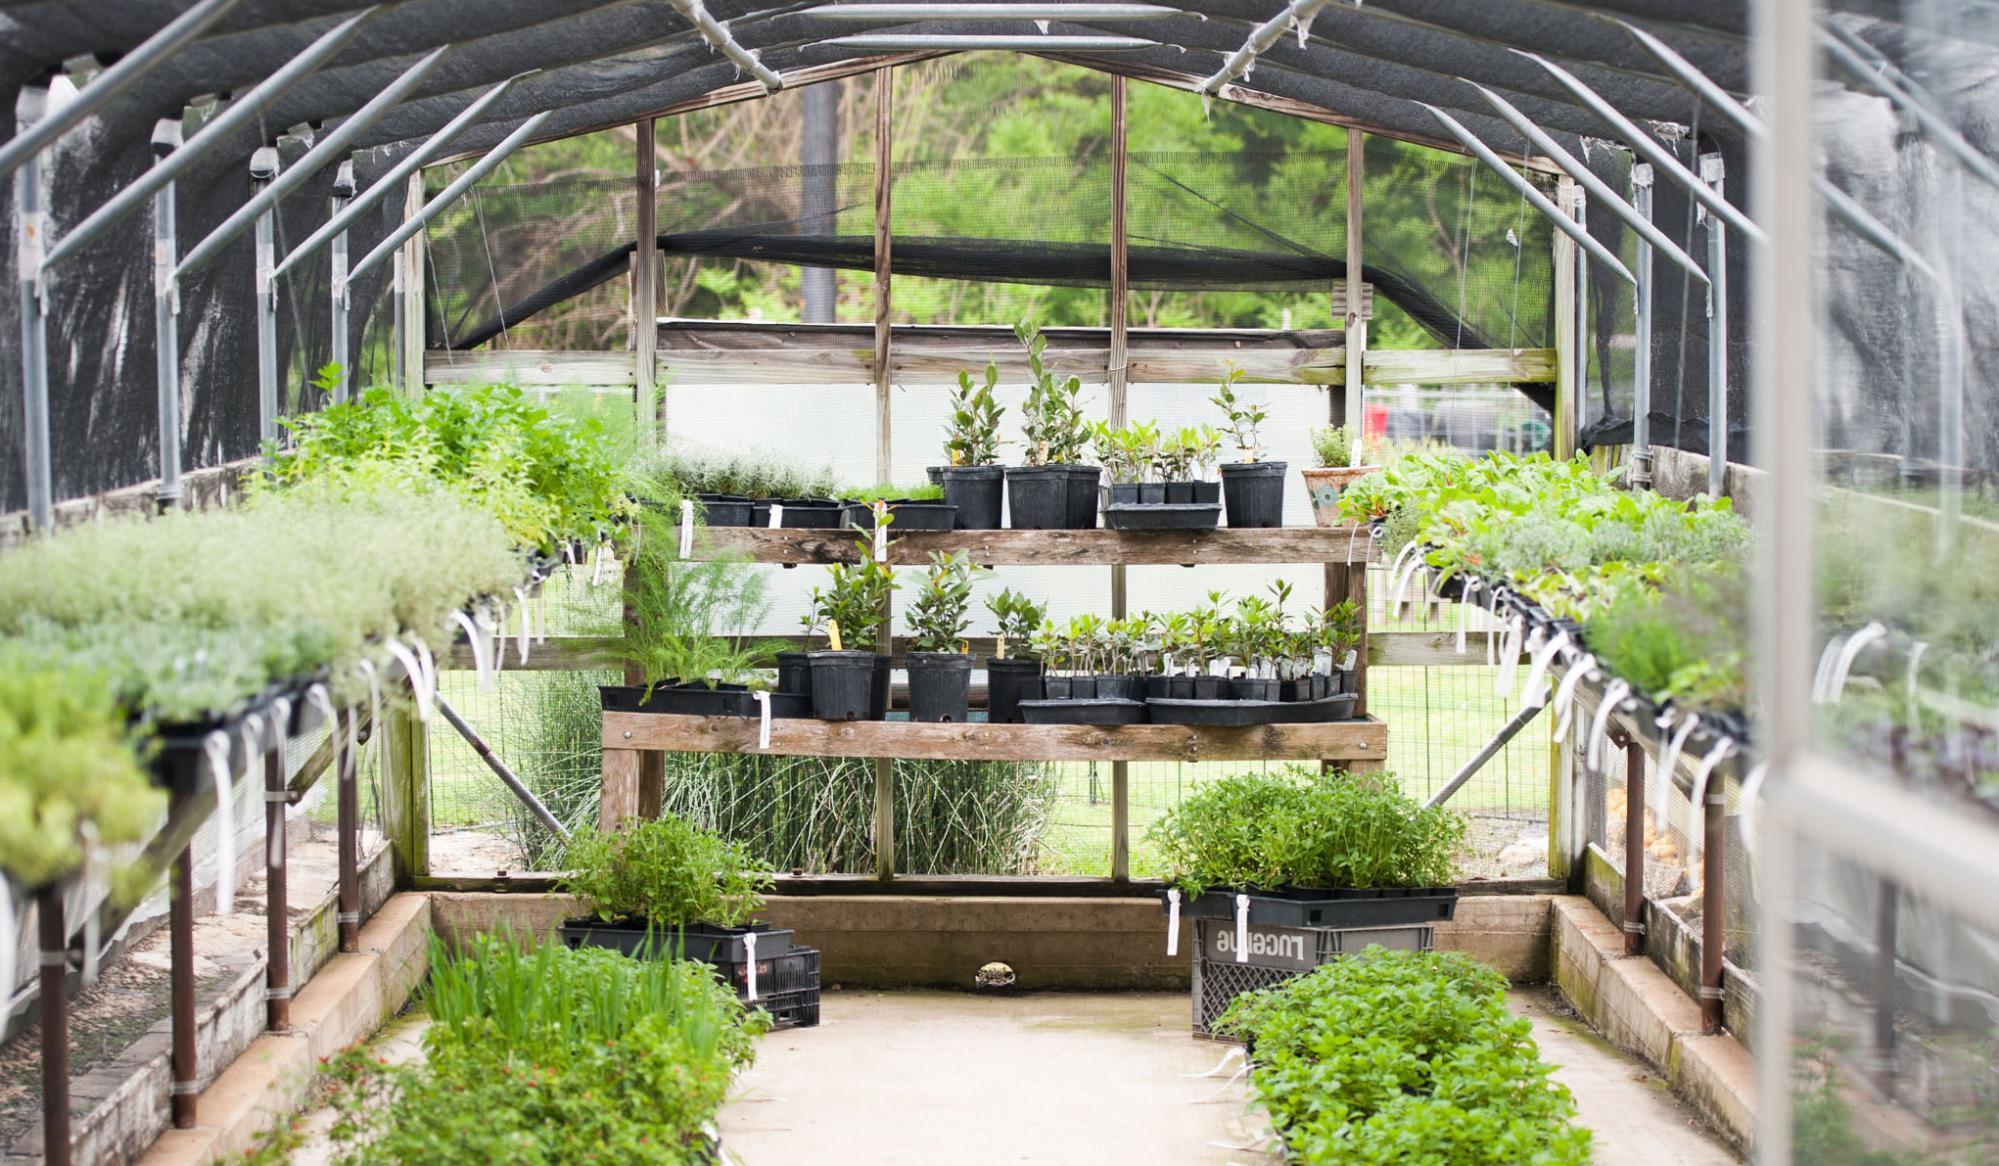 Greenhouse joanna gaines interior